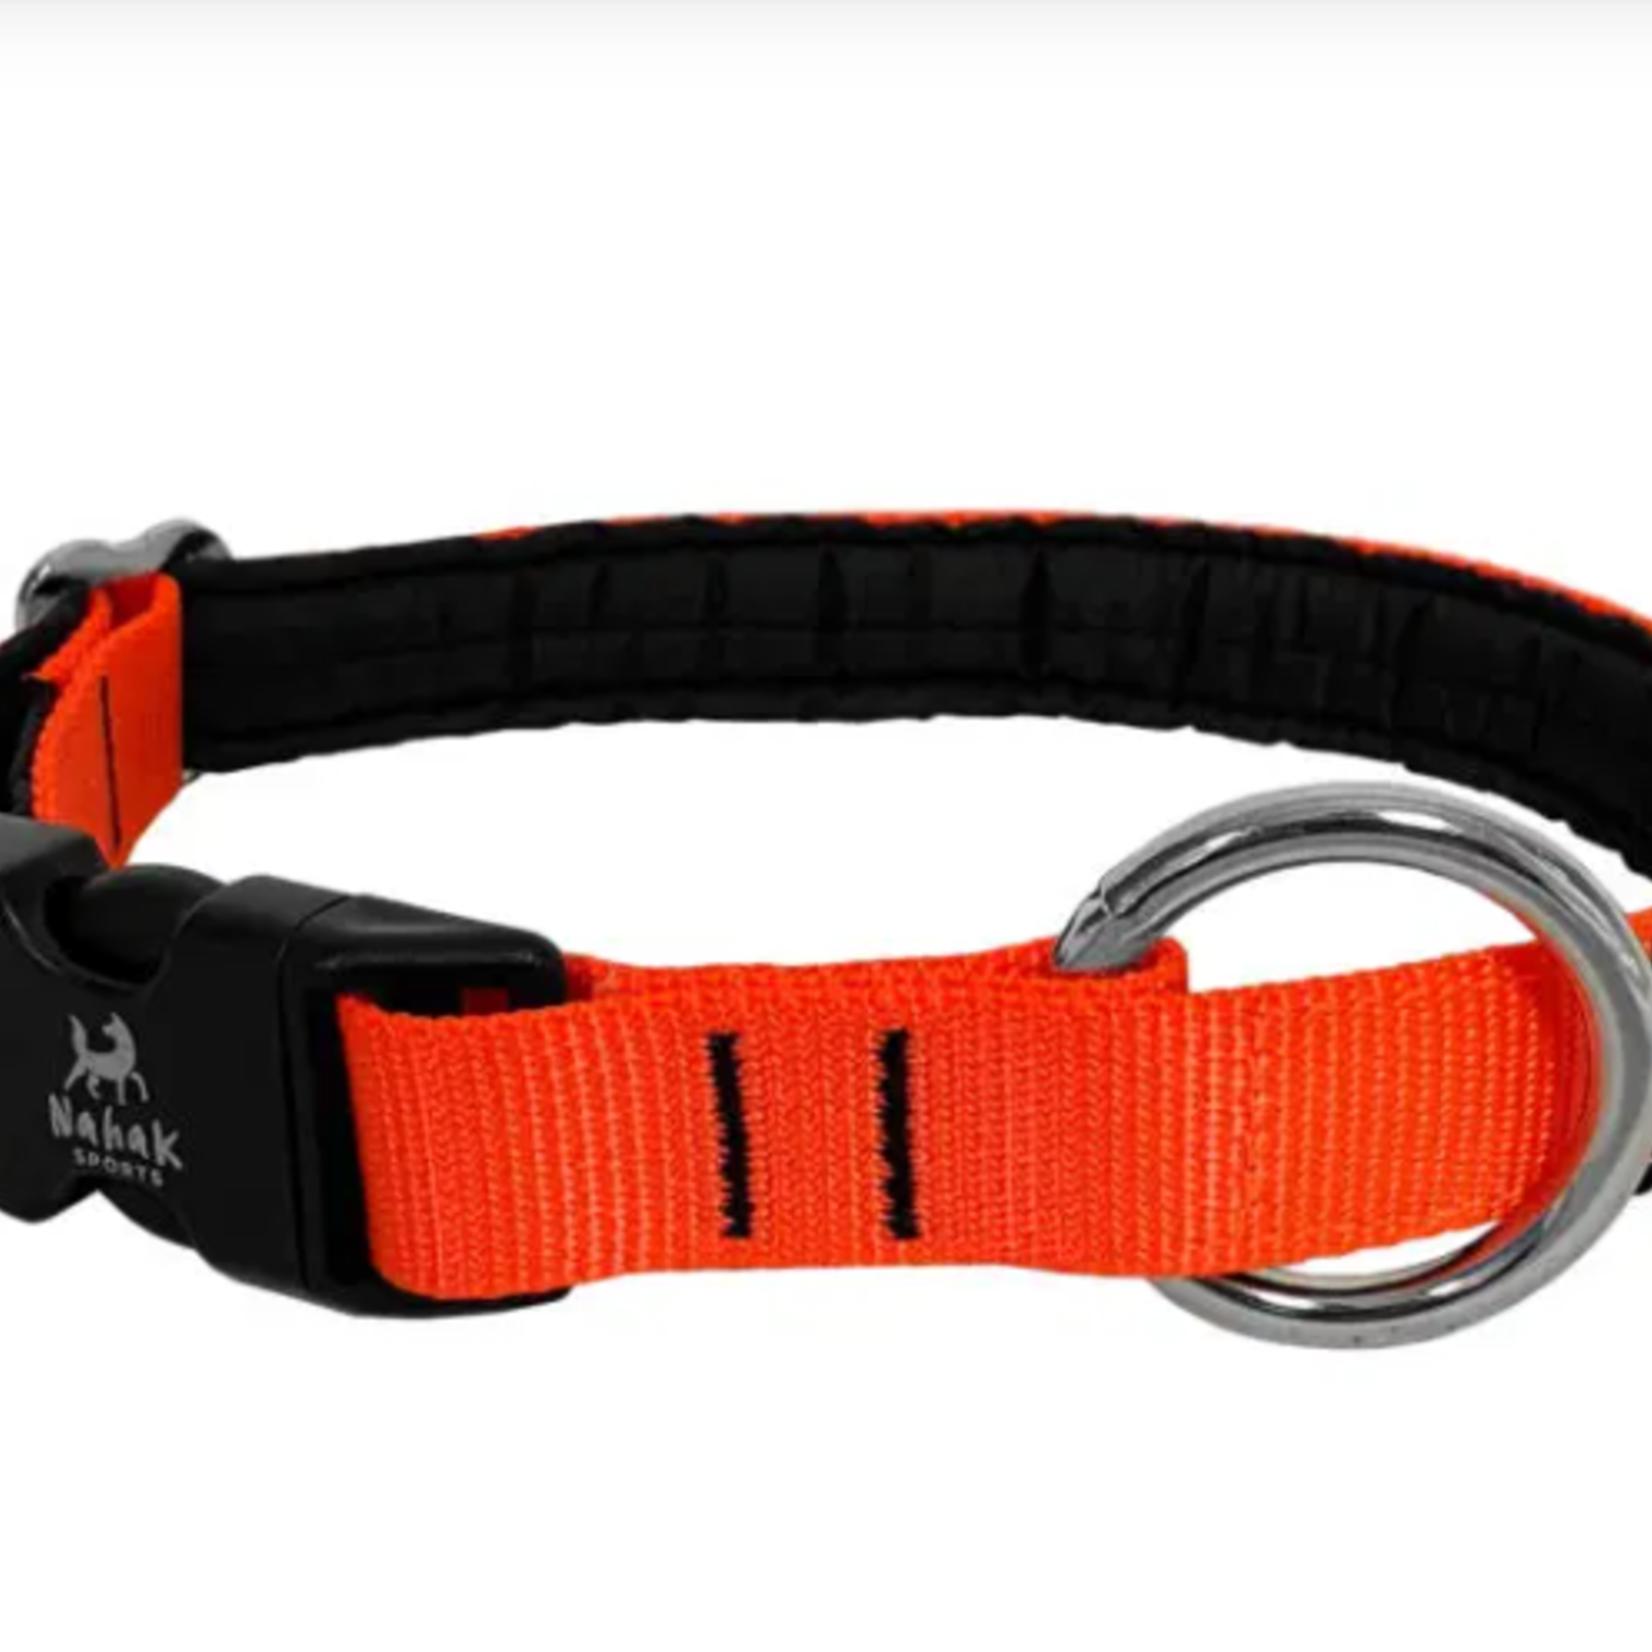 Nahak Padded Dog Collar With Clip